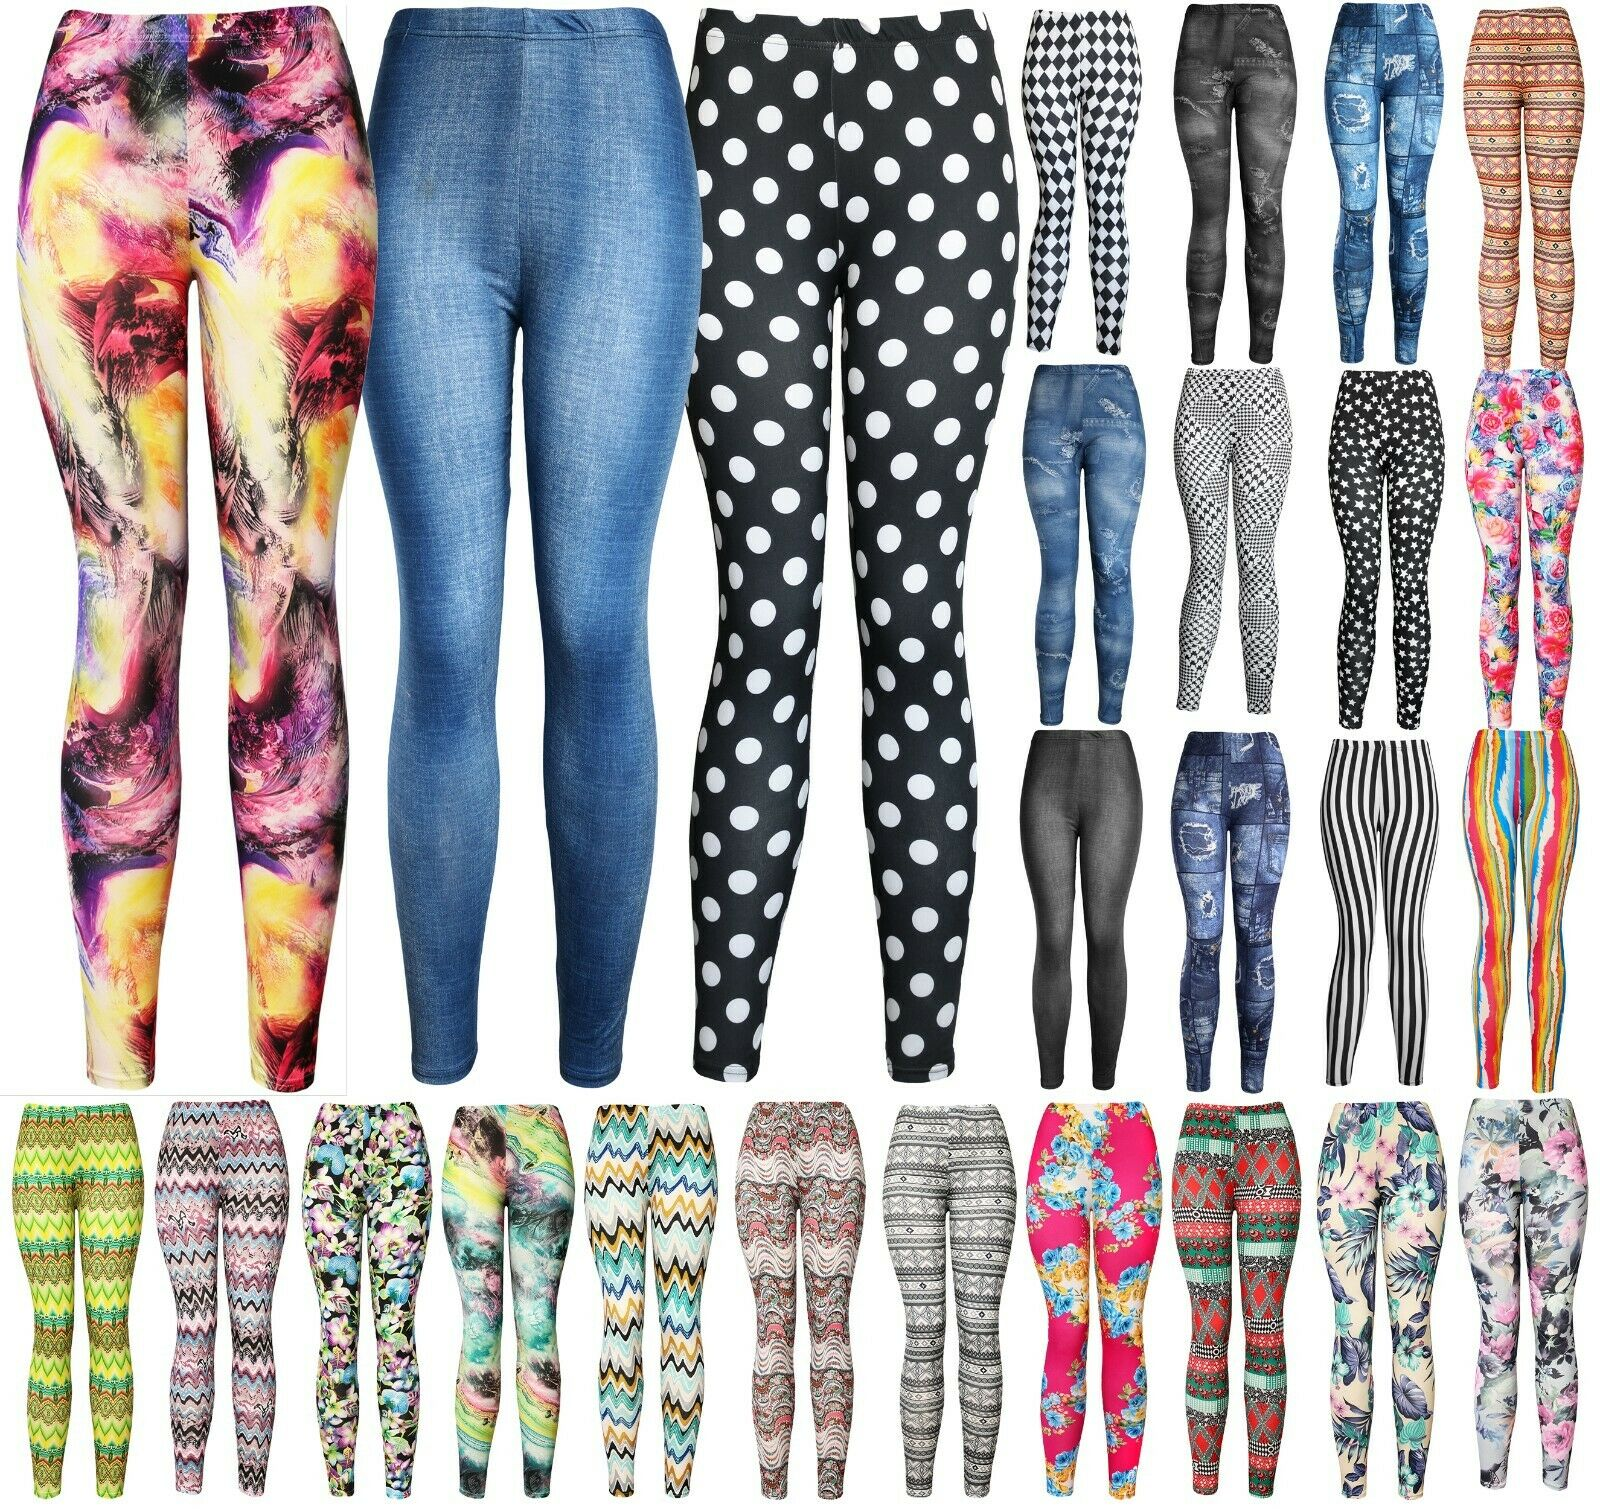 Women's REG/Plus Super Soft Cotton Blend Basic Workout Printed Pattern Leggings Clothing, Shoes & Accessories